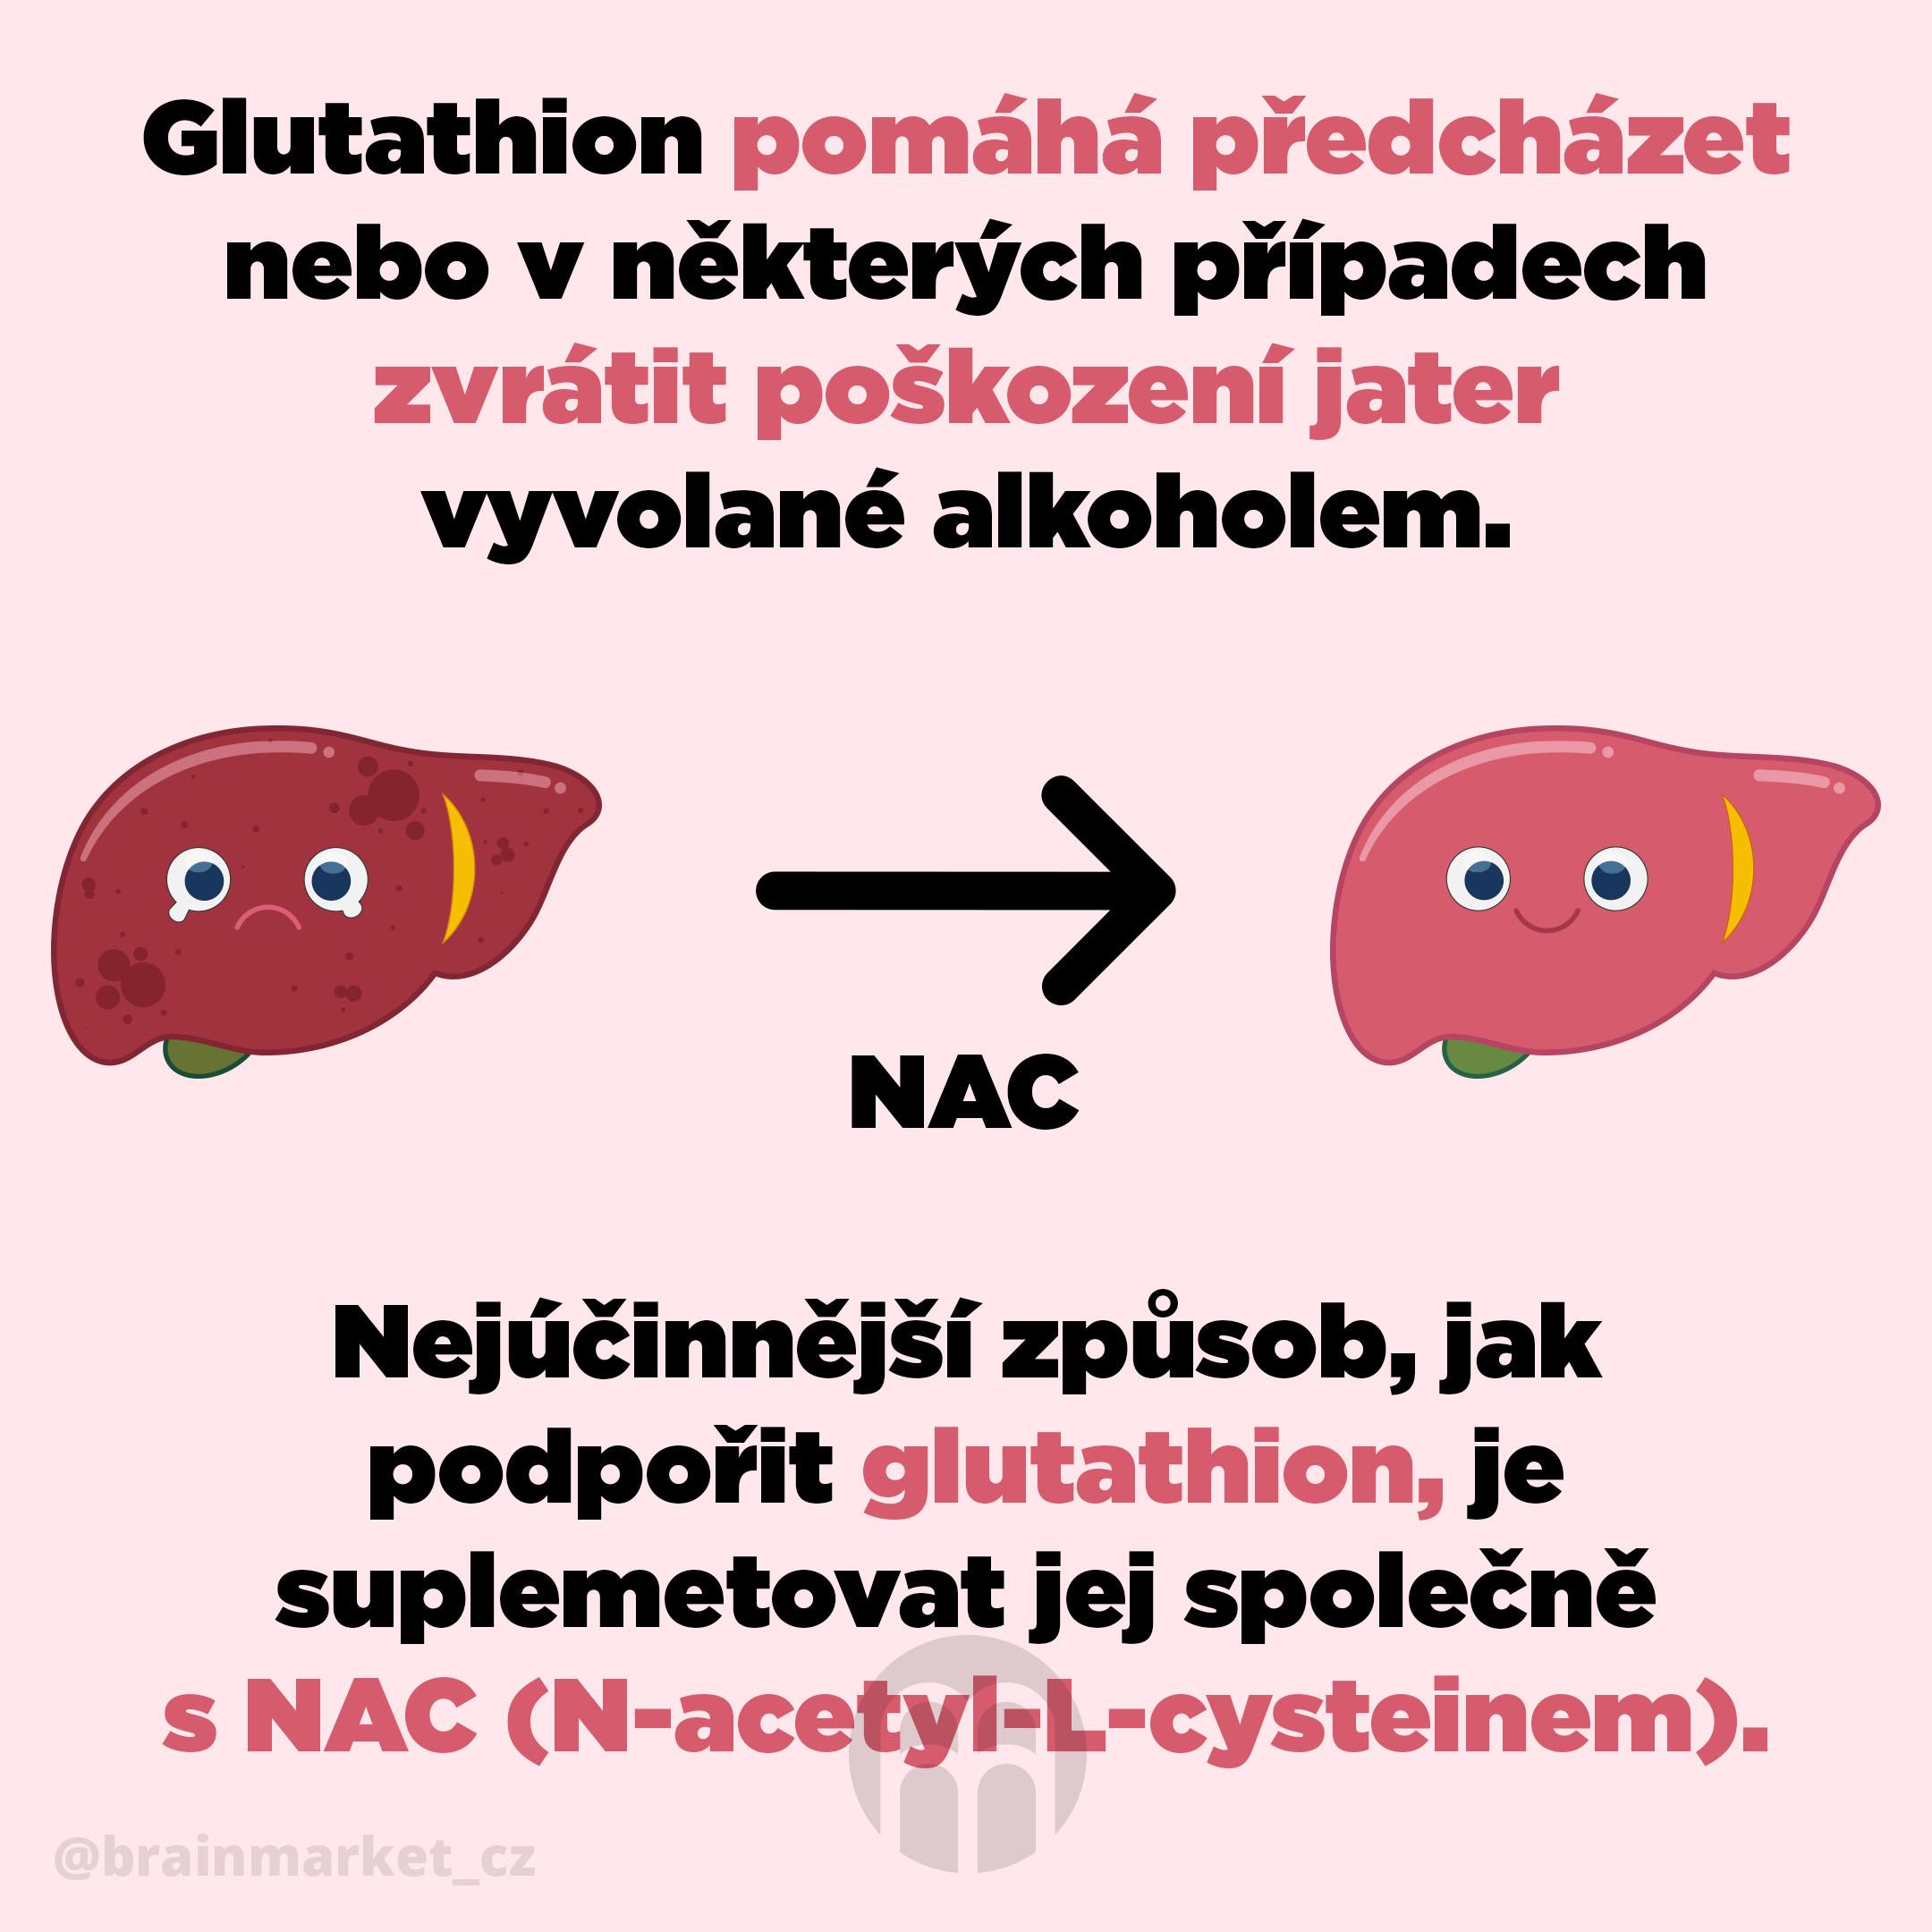 poskozeni_jater_NAC_Infografika_Instagram_BrainMarket